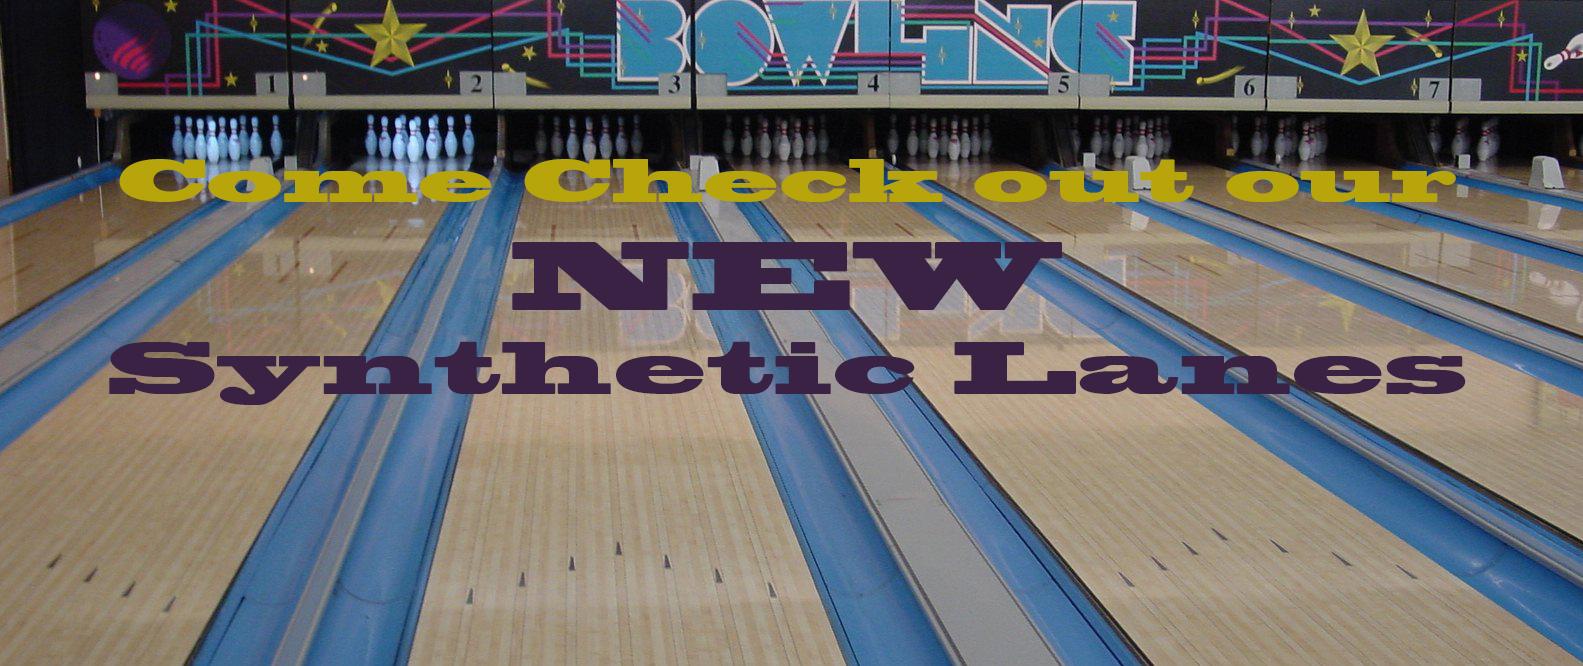 Bowling Alley Cedarburg Grafton Mequon Theinsville Port